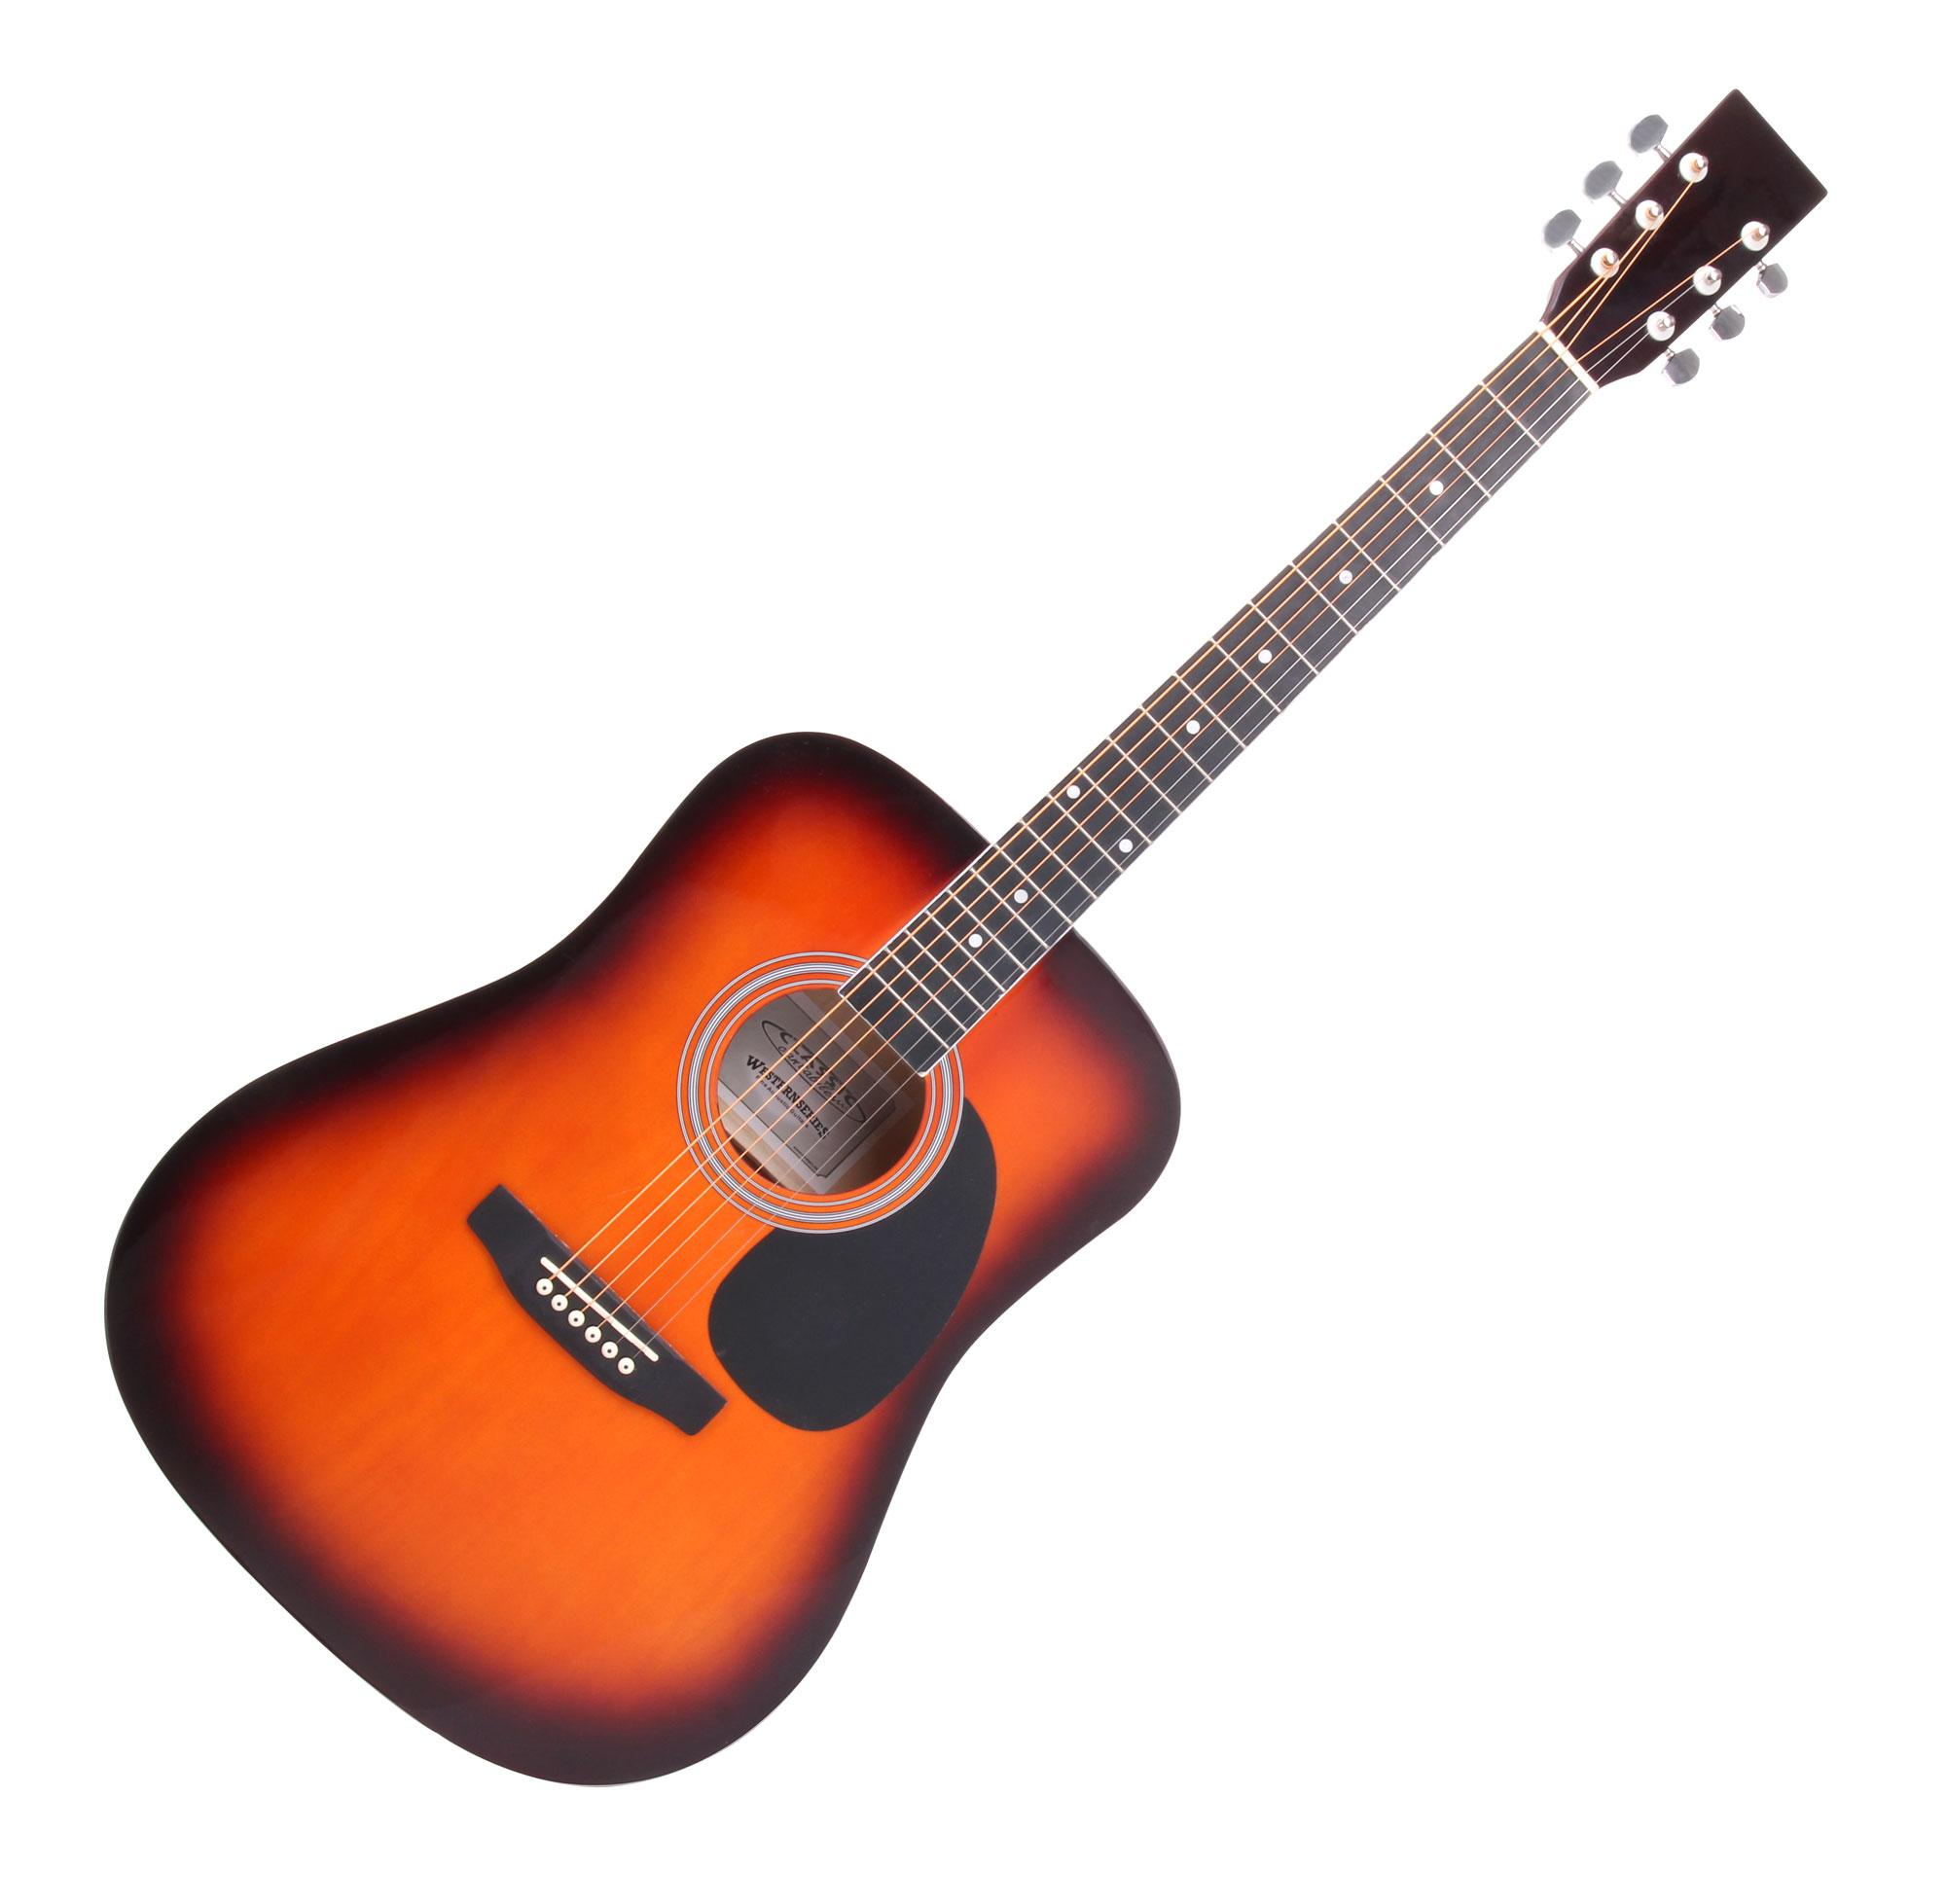 dreadnought westerngitarre stahlsaiten akustik gitarre einsteigergitarre guitar ebay. Black Bedroom Furniture Sets. Home Design Ideas